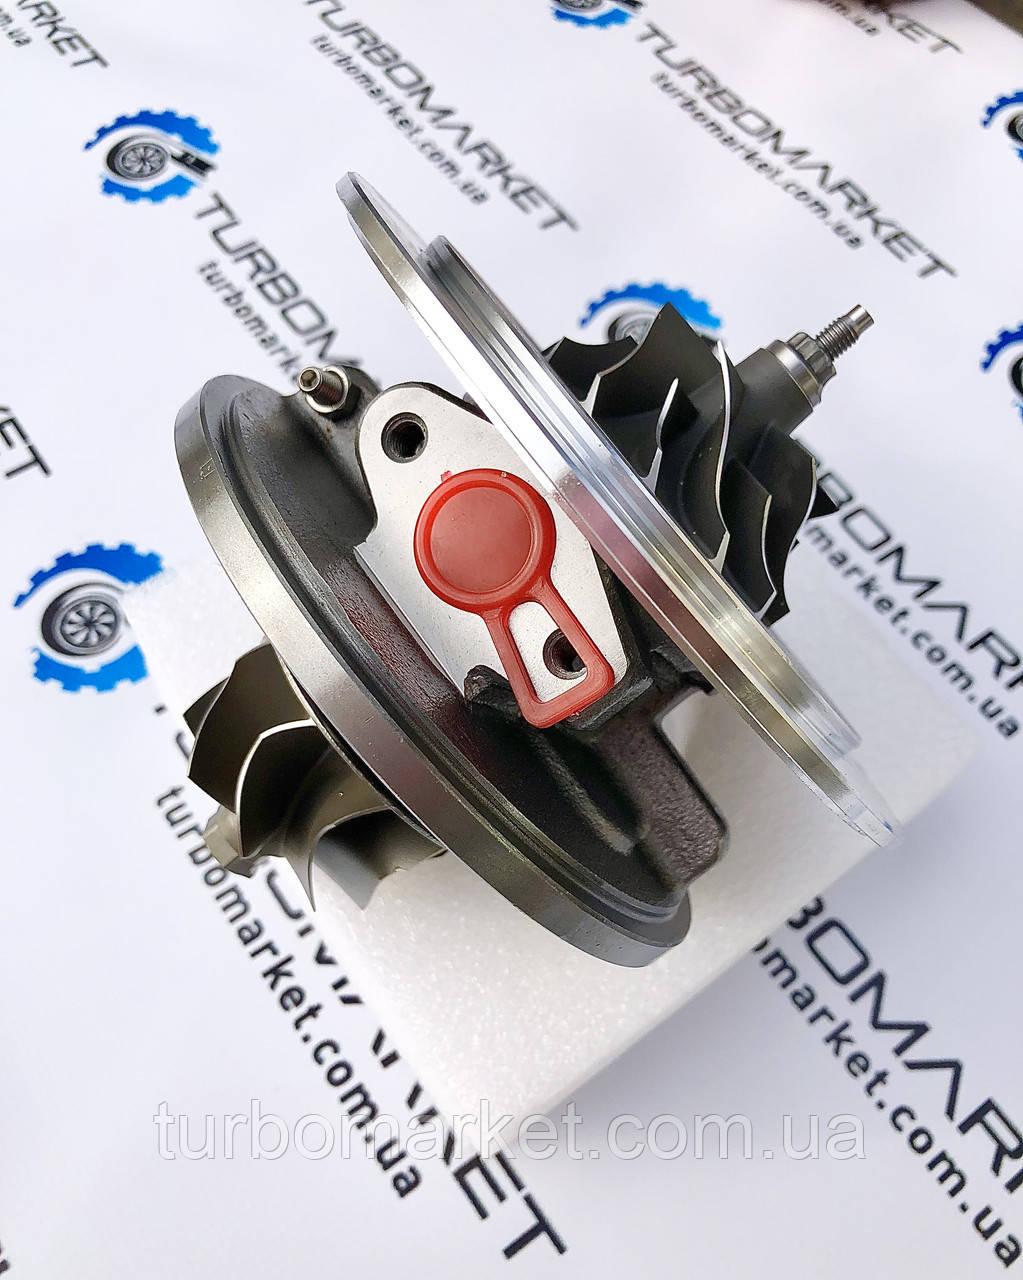 Картридж турбины BMW 530D/730D, M57D/E38/E39, 3.0D,454191-0008,,454191-0012, 454191-0013,454191-0015